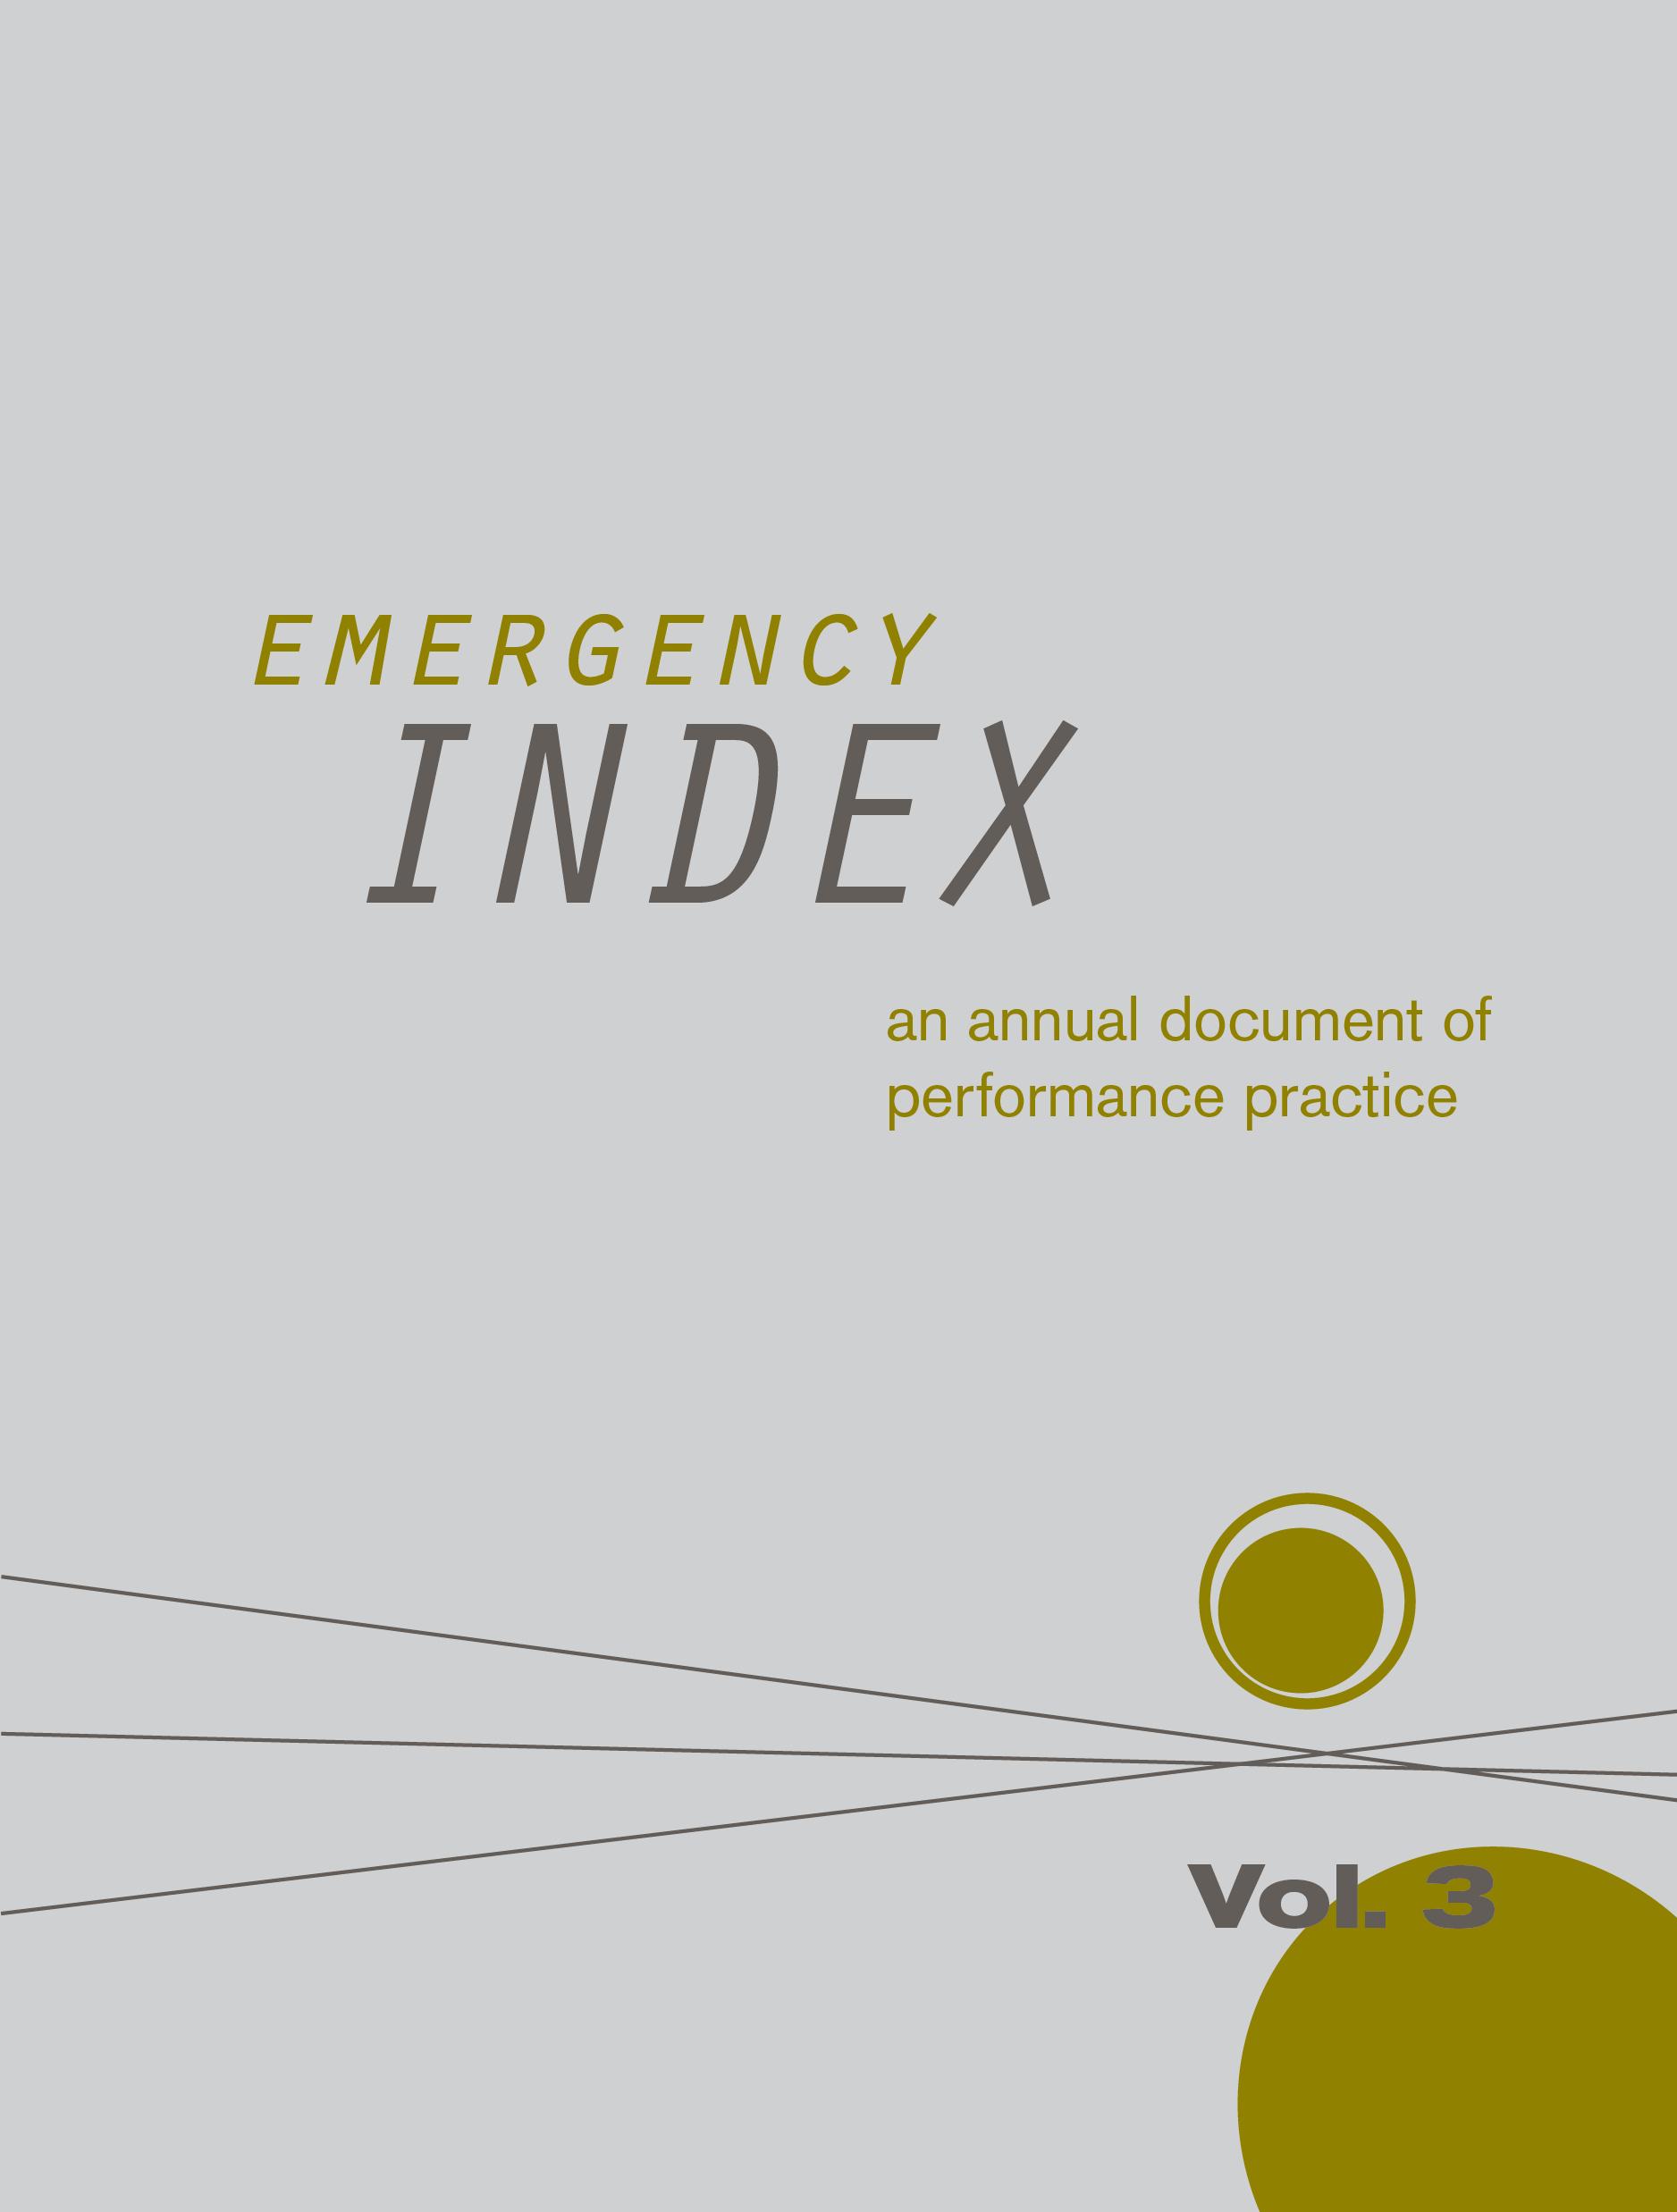 Emergency Index Vol. 3